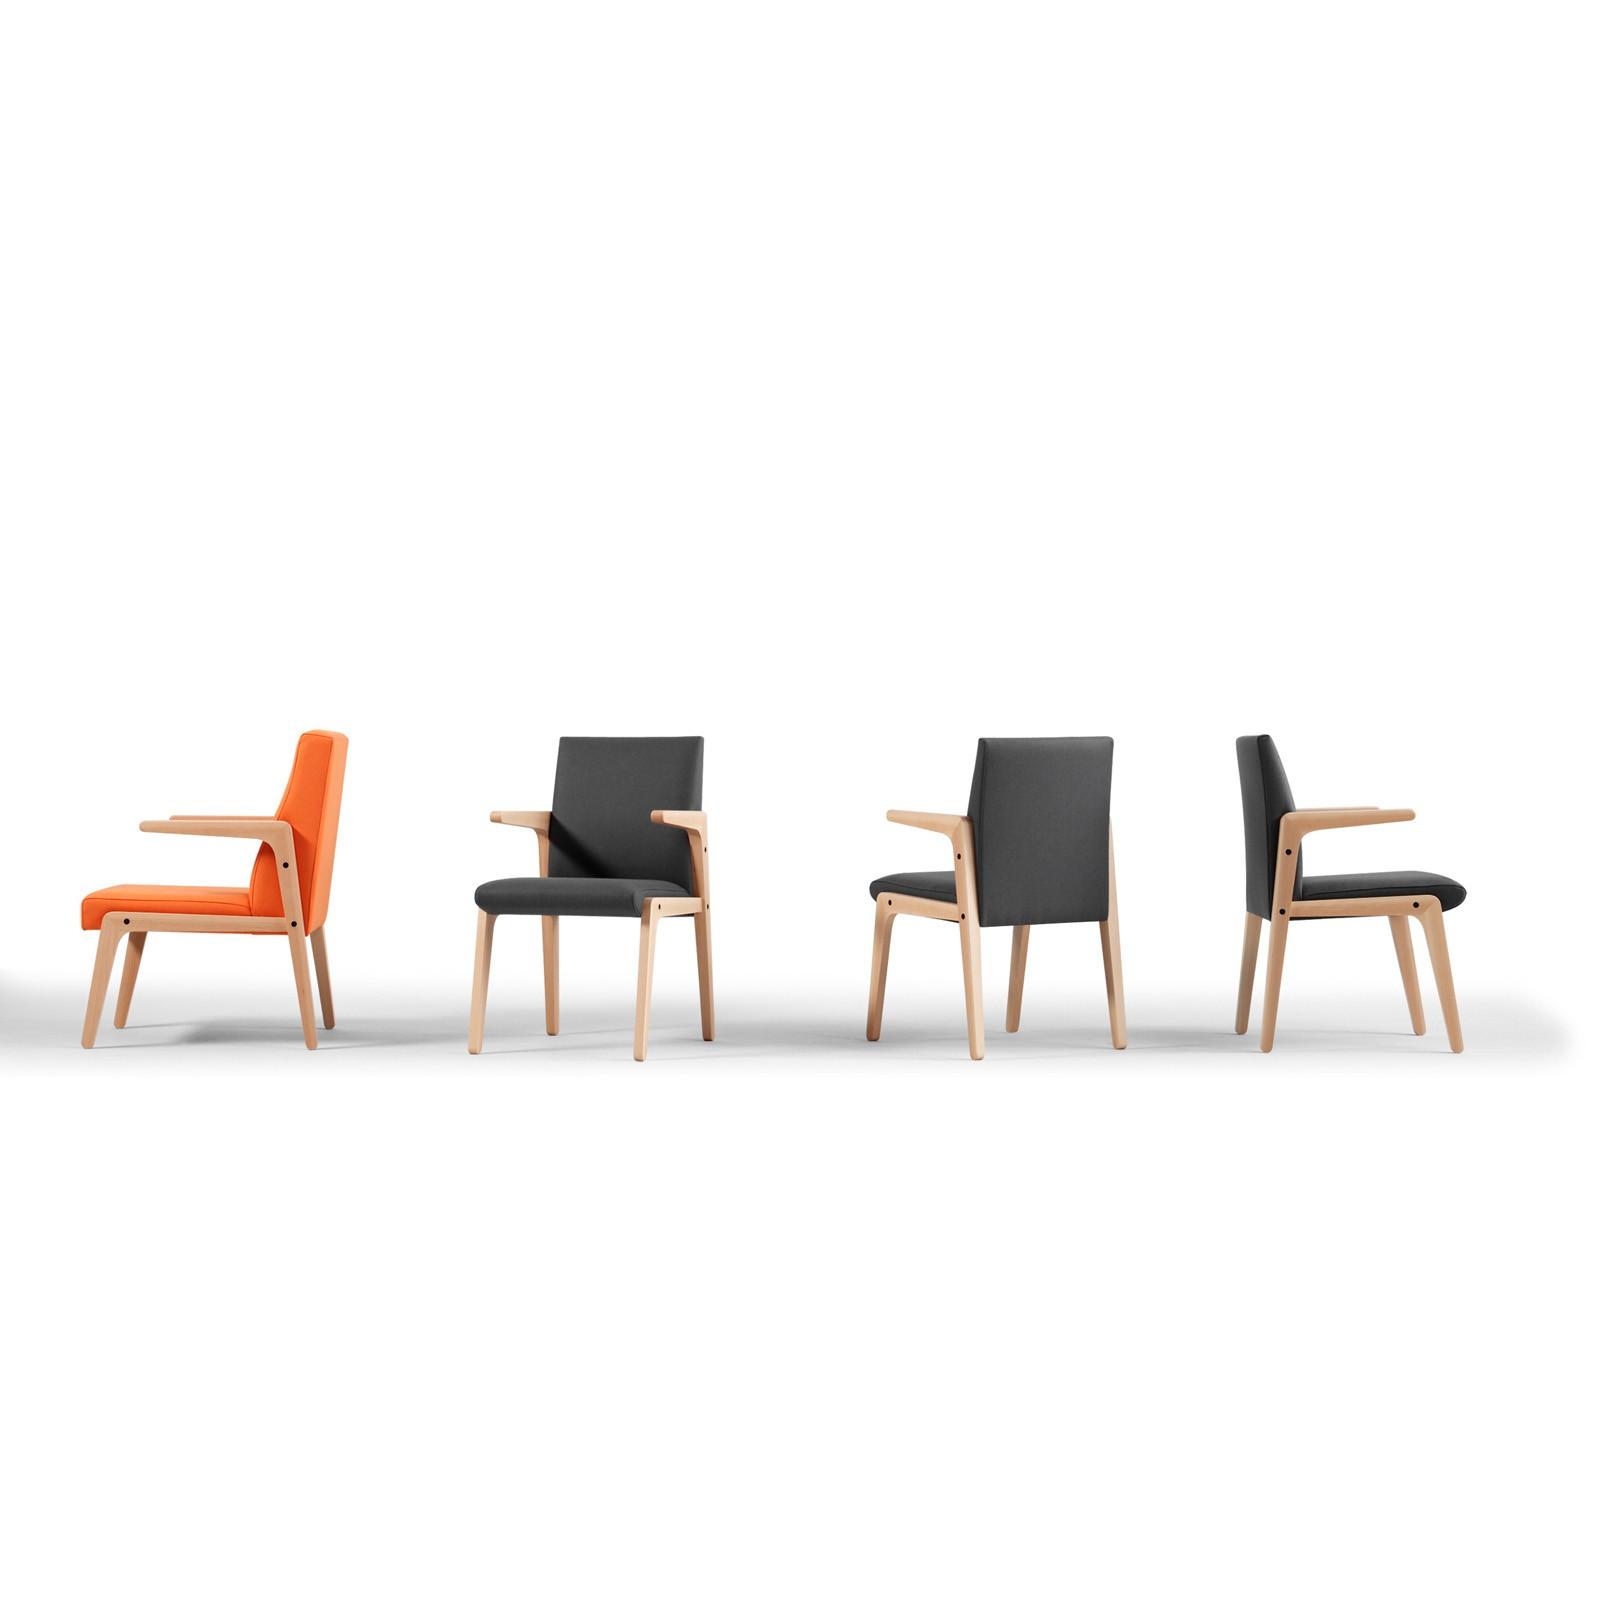 kezu_proyec_boomerang_chairs_deepetch2_1_1